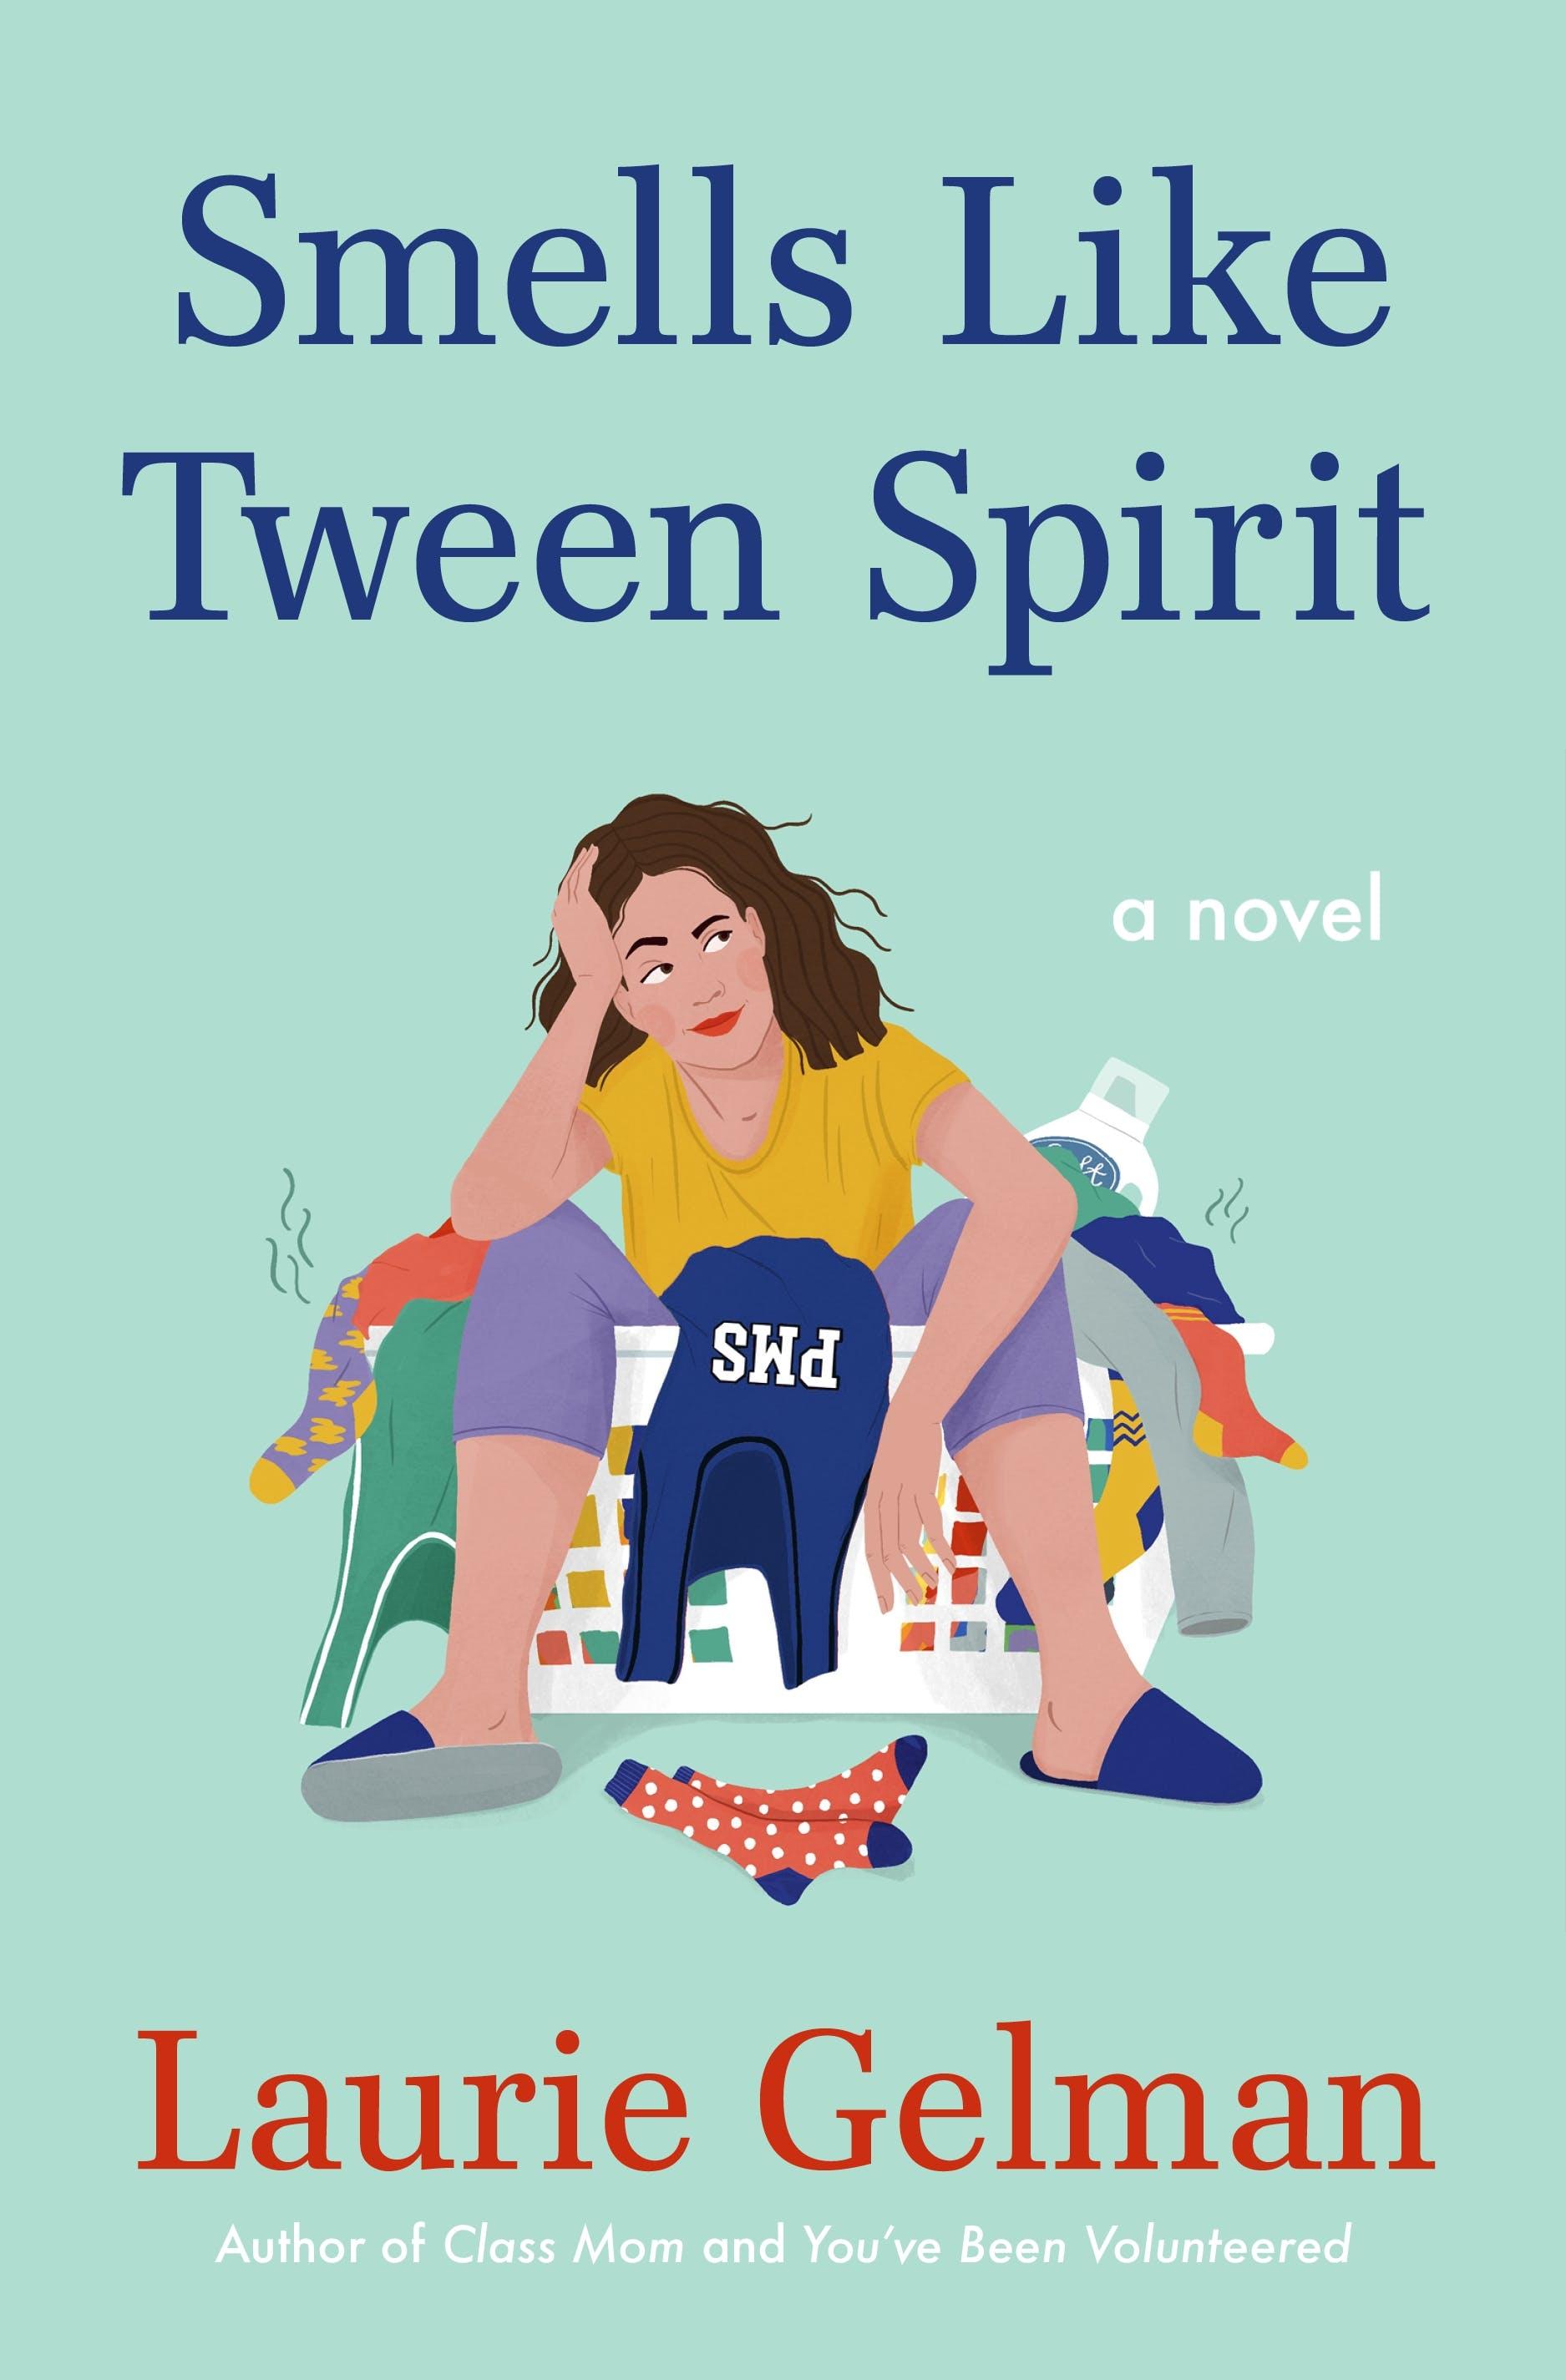 Image of Smells Like Tween Spirit